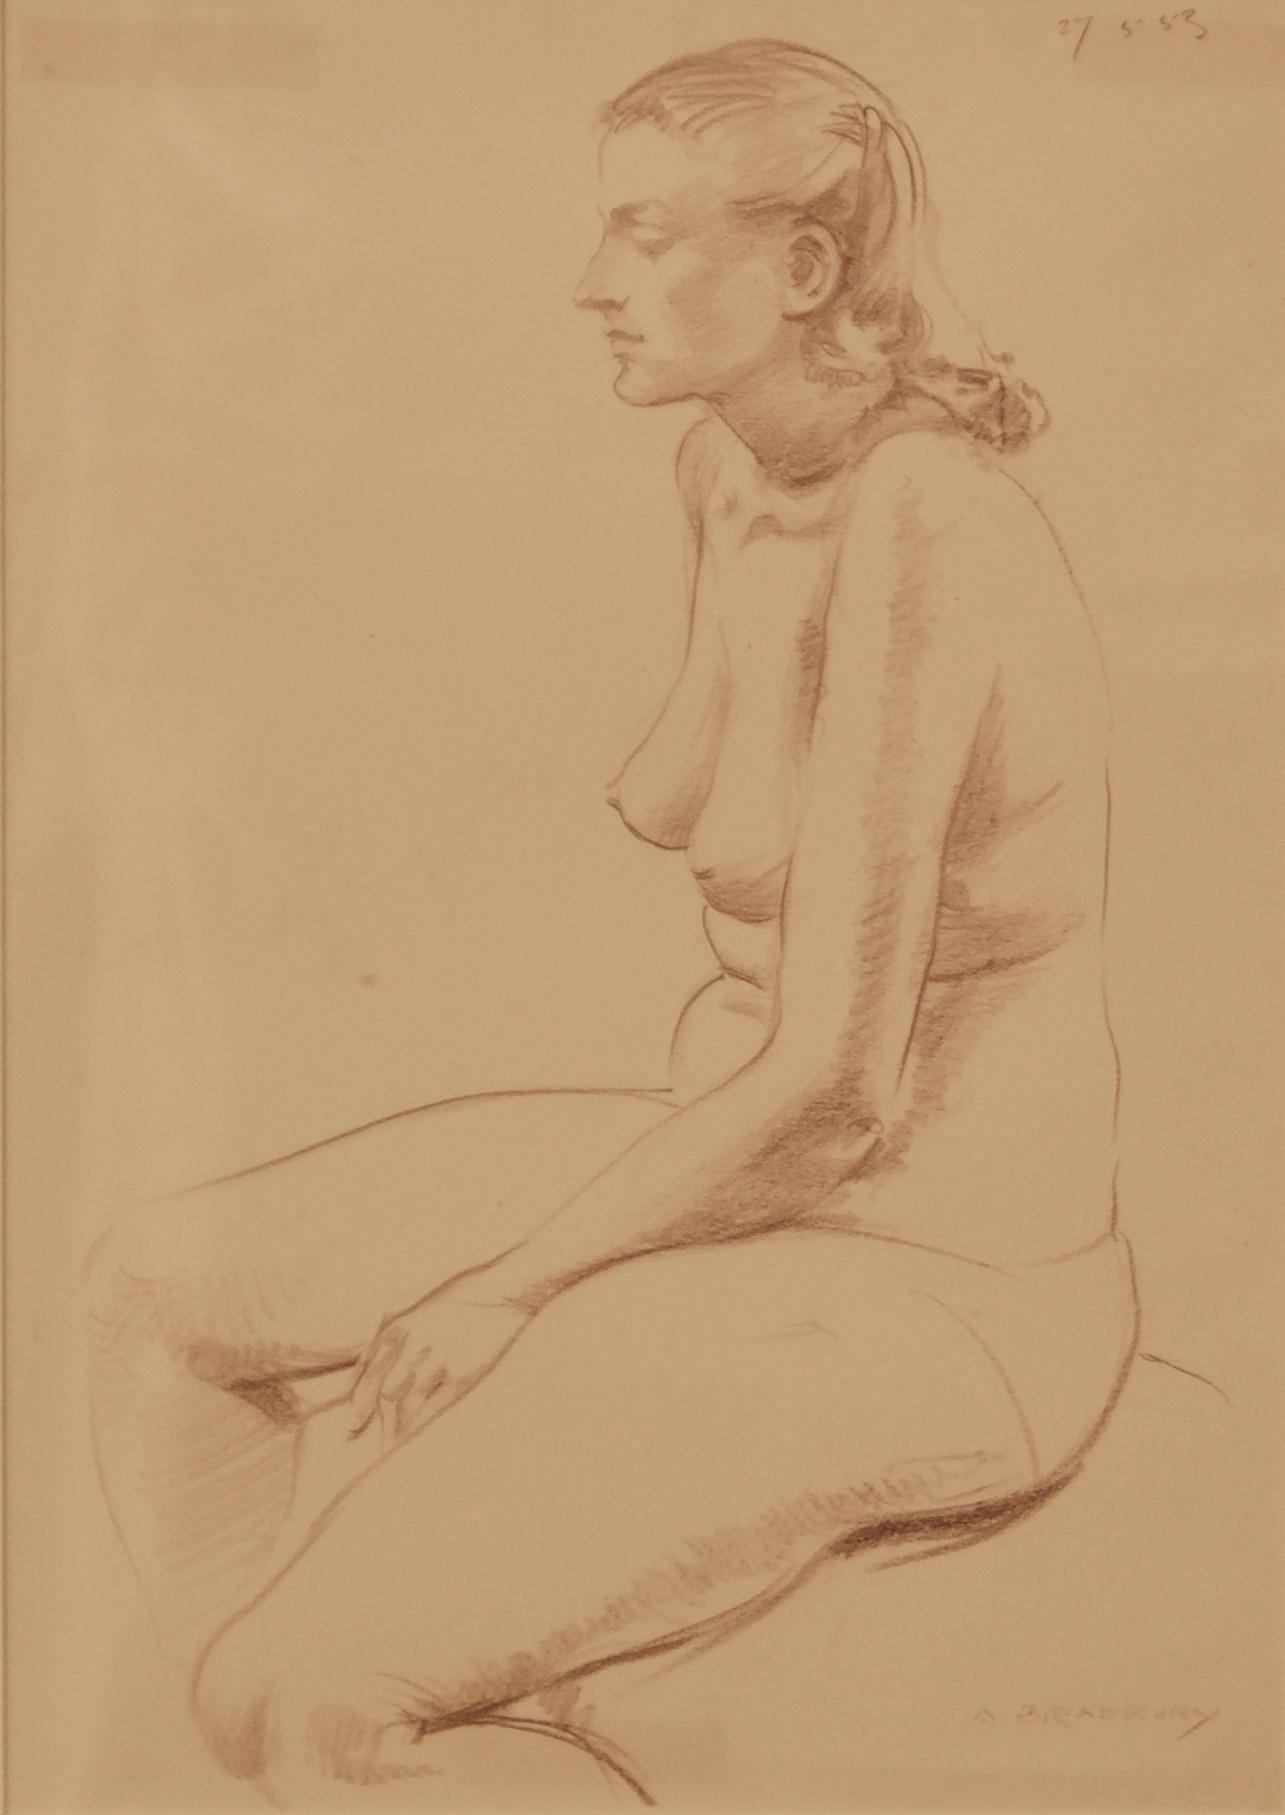 Nude Woman Still Life - Pencil Figurative Still Life of Nude Lady by A. Bradbury